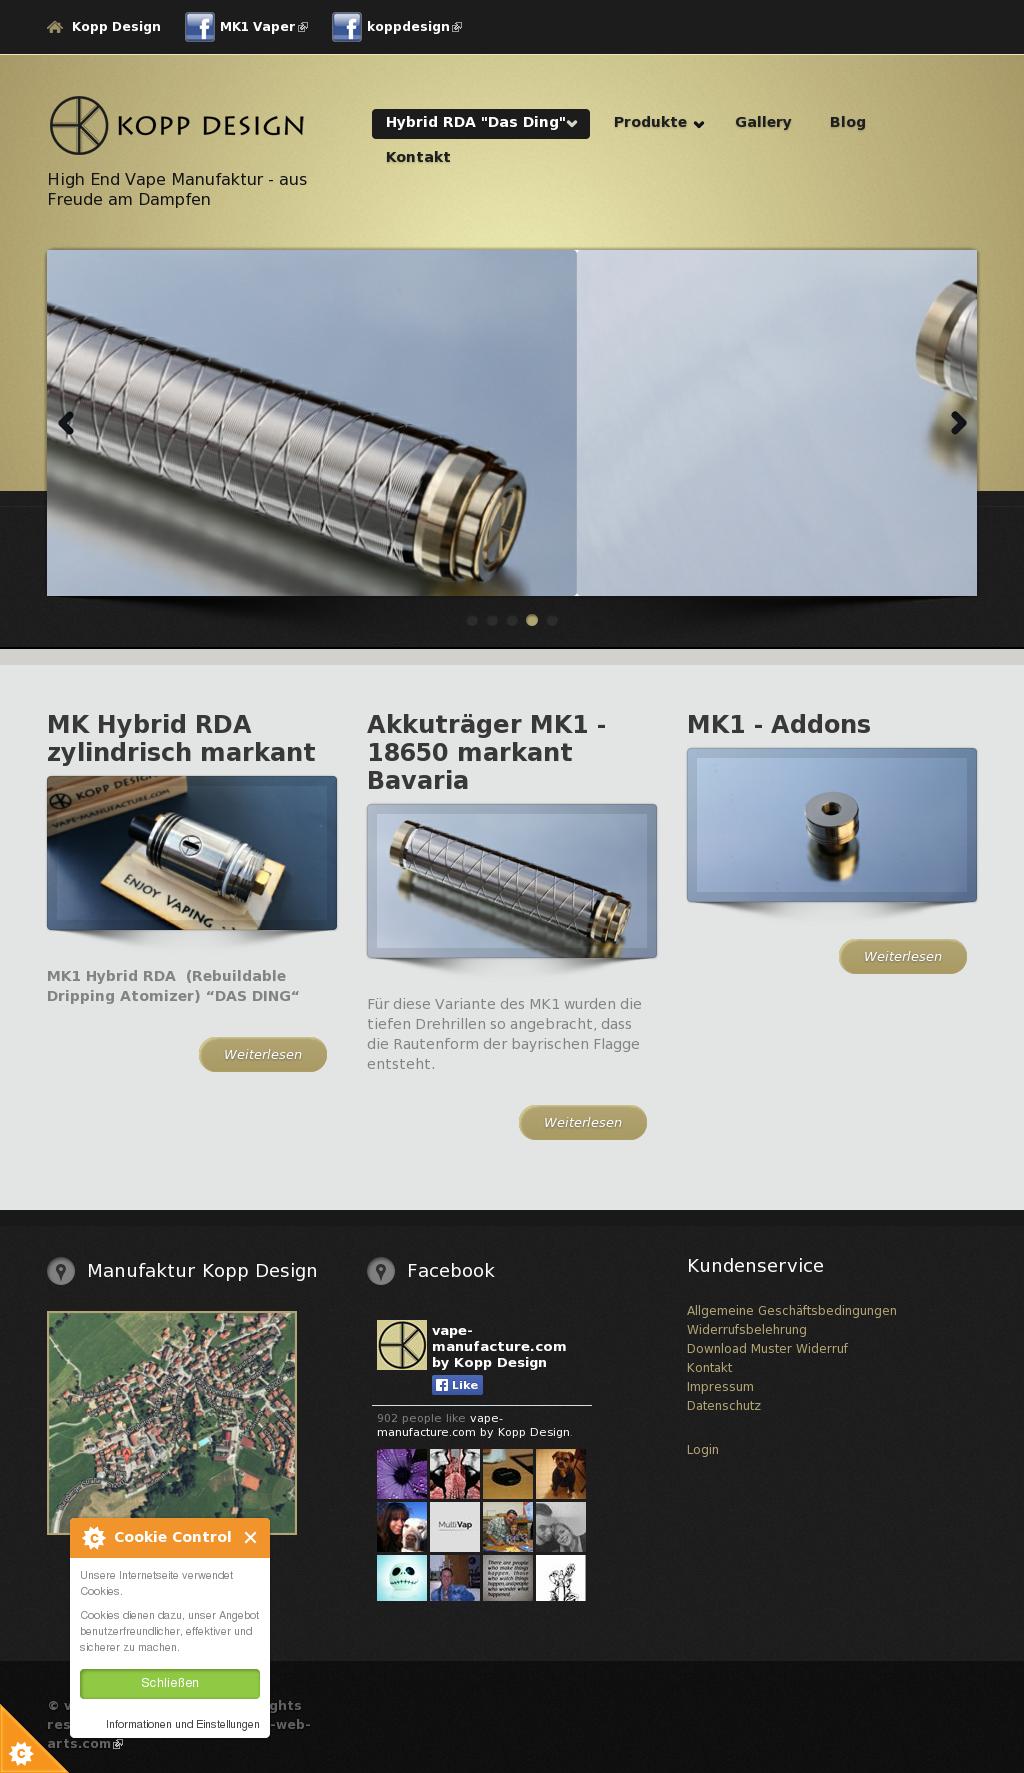 Vape-manufacture.com By Kopp Design Competitors, Revenue and ...